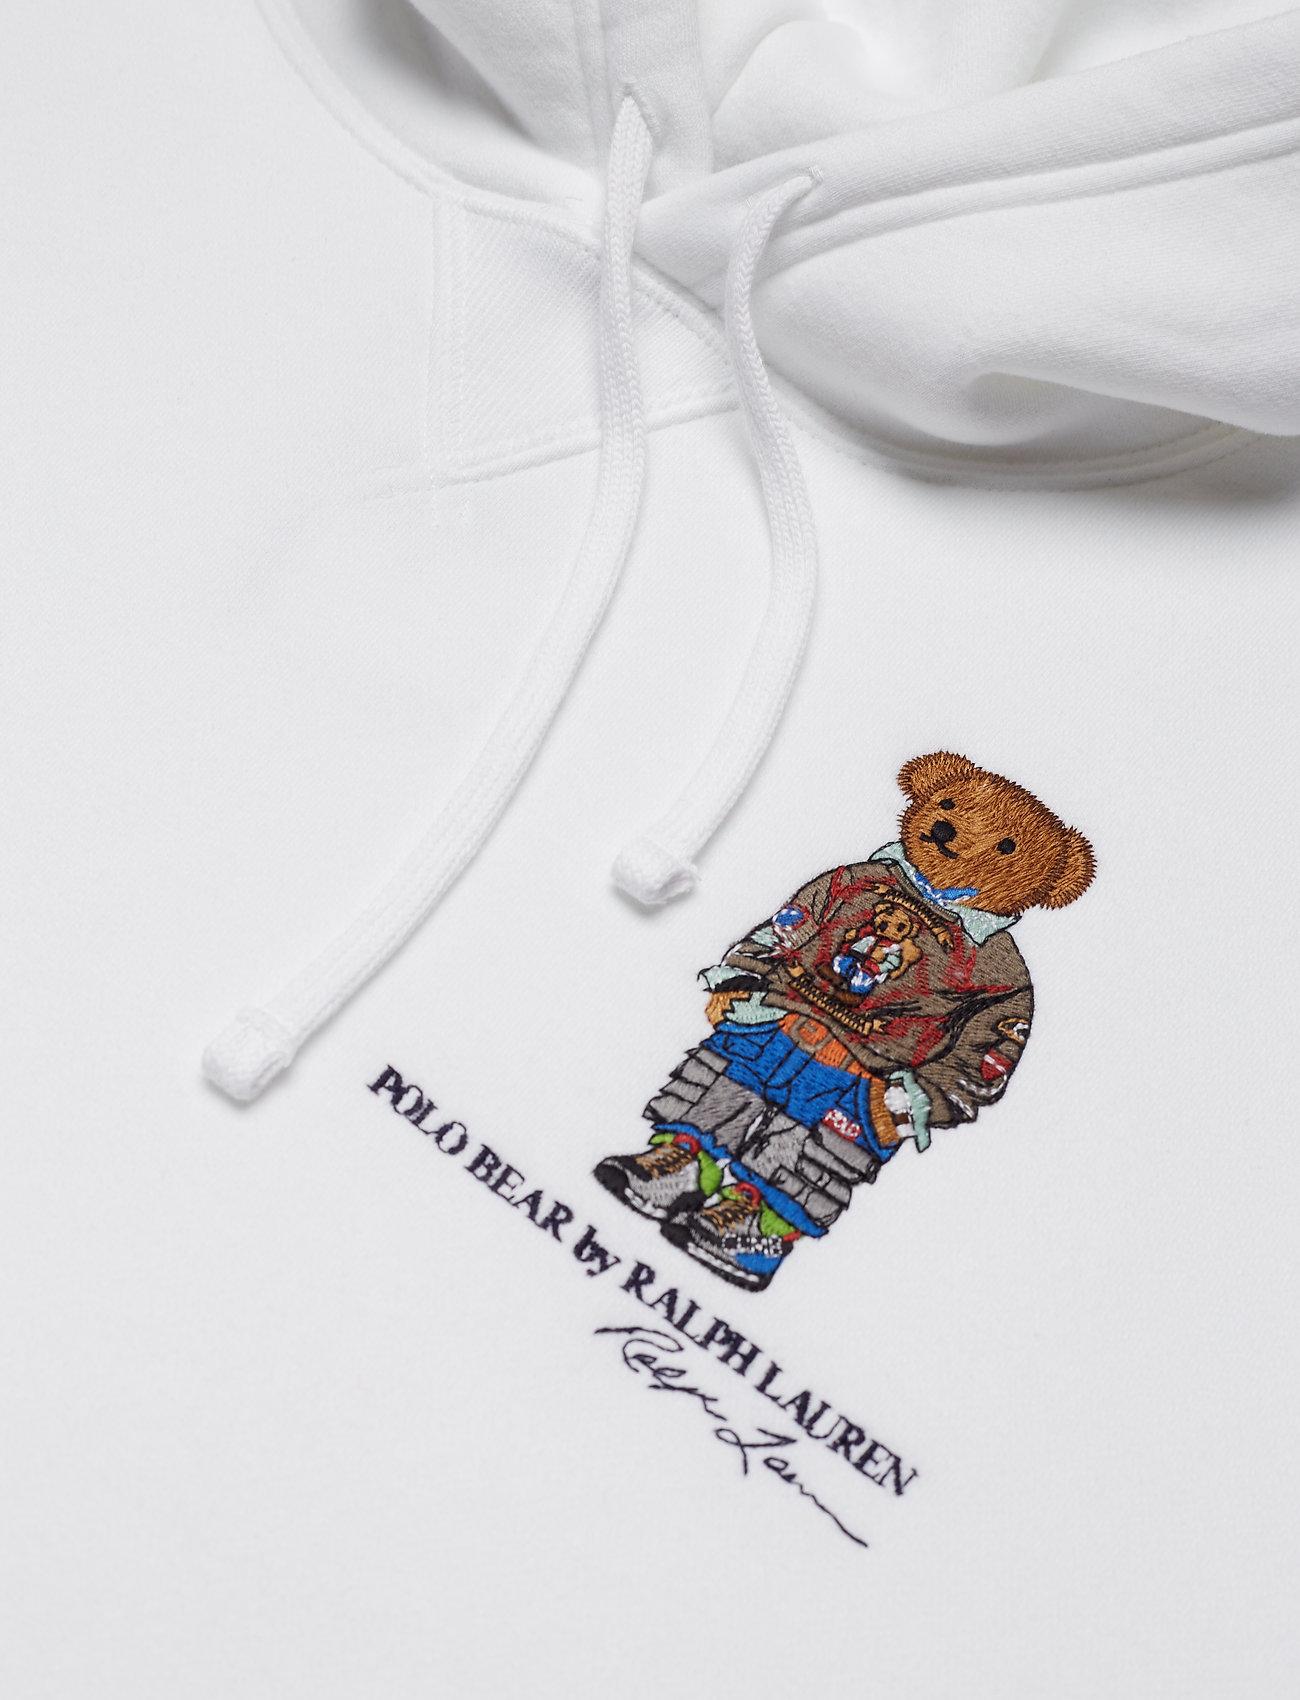 M3 Ralph Lspohood long Sleeve Lauren knitwhitePolo trCdhQs